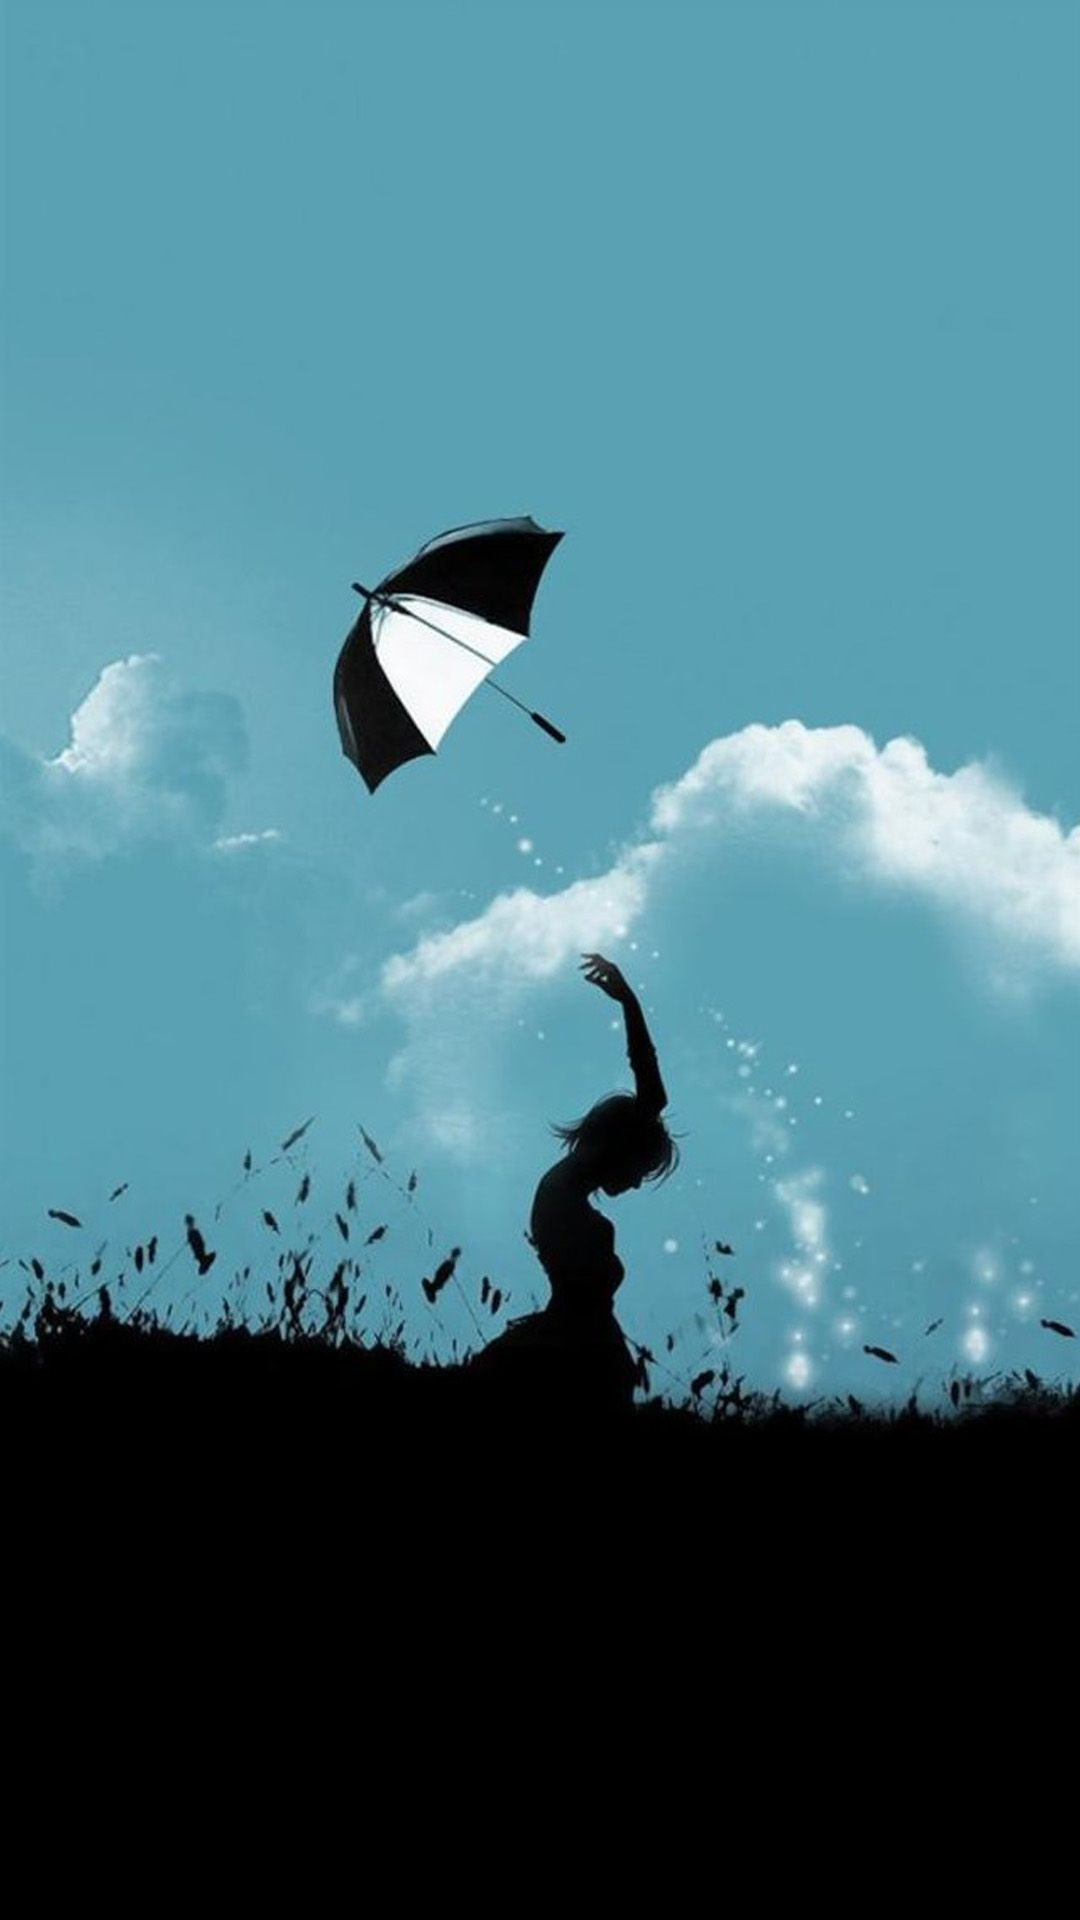 Hill Umbrella Throw At Cloudy Sky iPhone Wallpaper